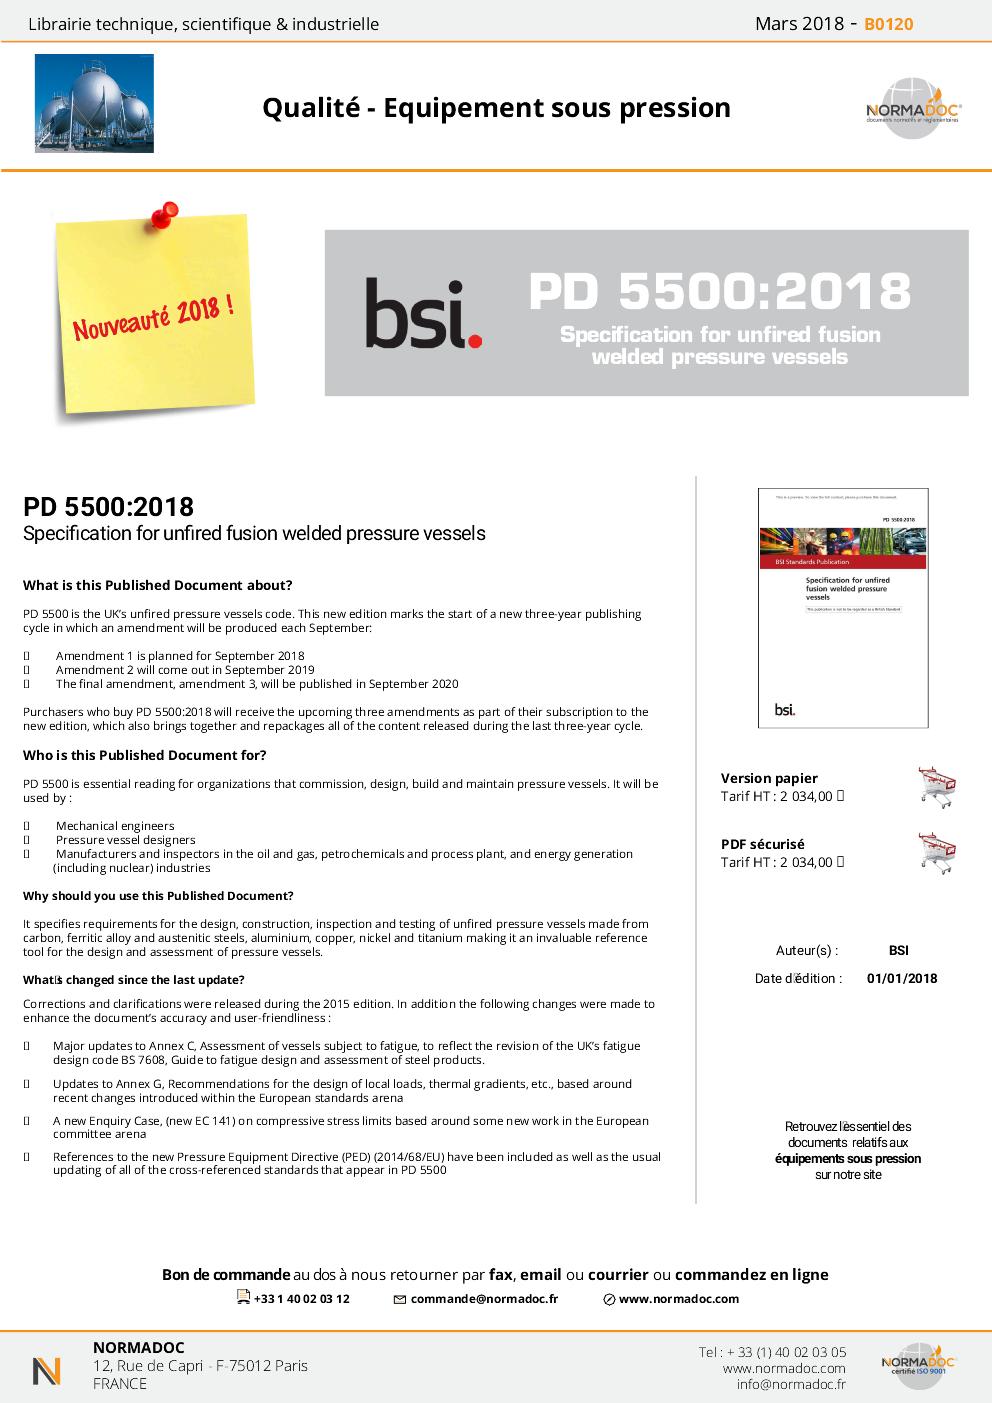 PD 5500:2015